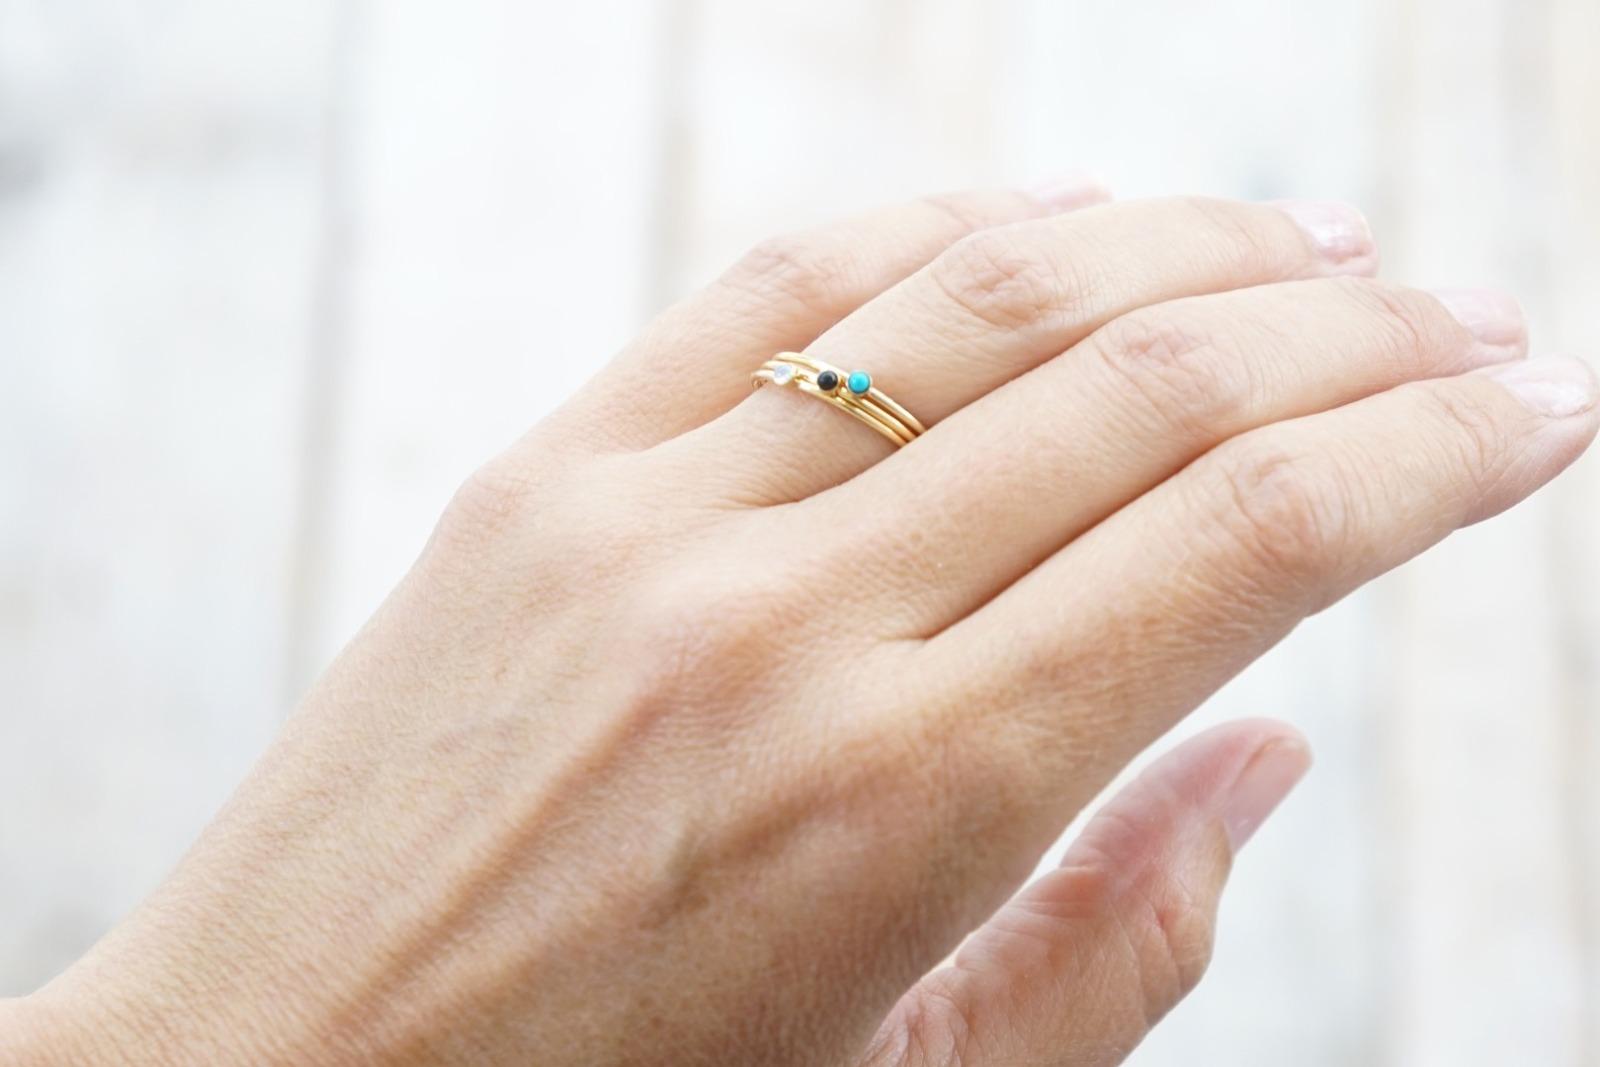 Zierlicher Ring Stapelring vergoldet Rosa Opal Fassung - 4